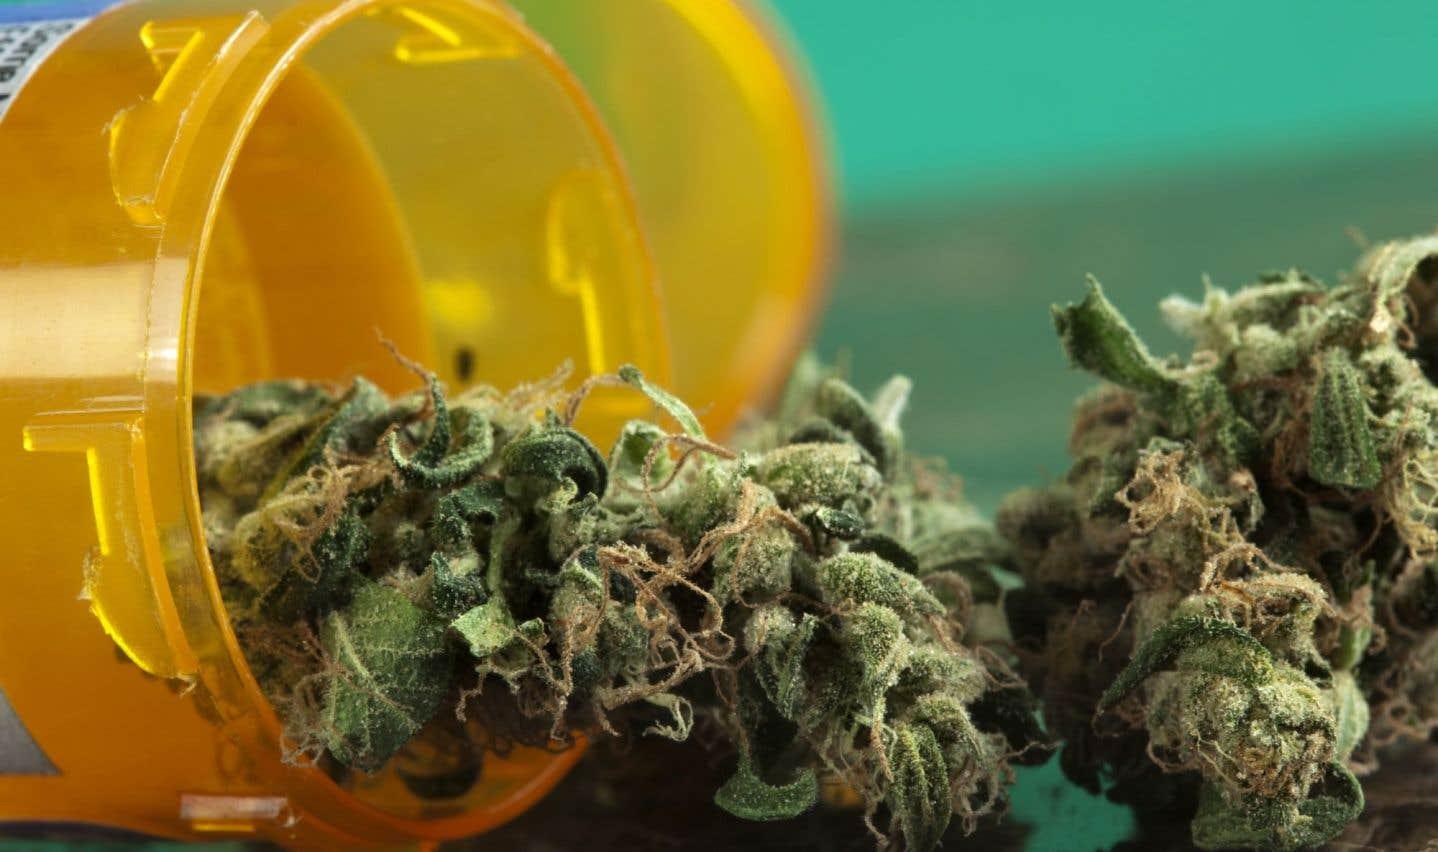 Ottawa violera peut-être des traités en légalisant la marijuana